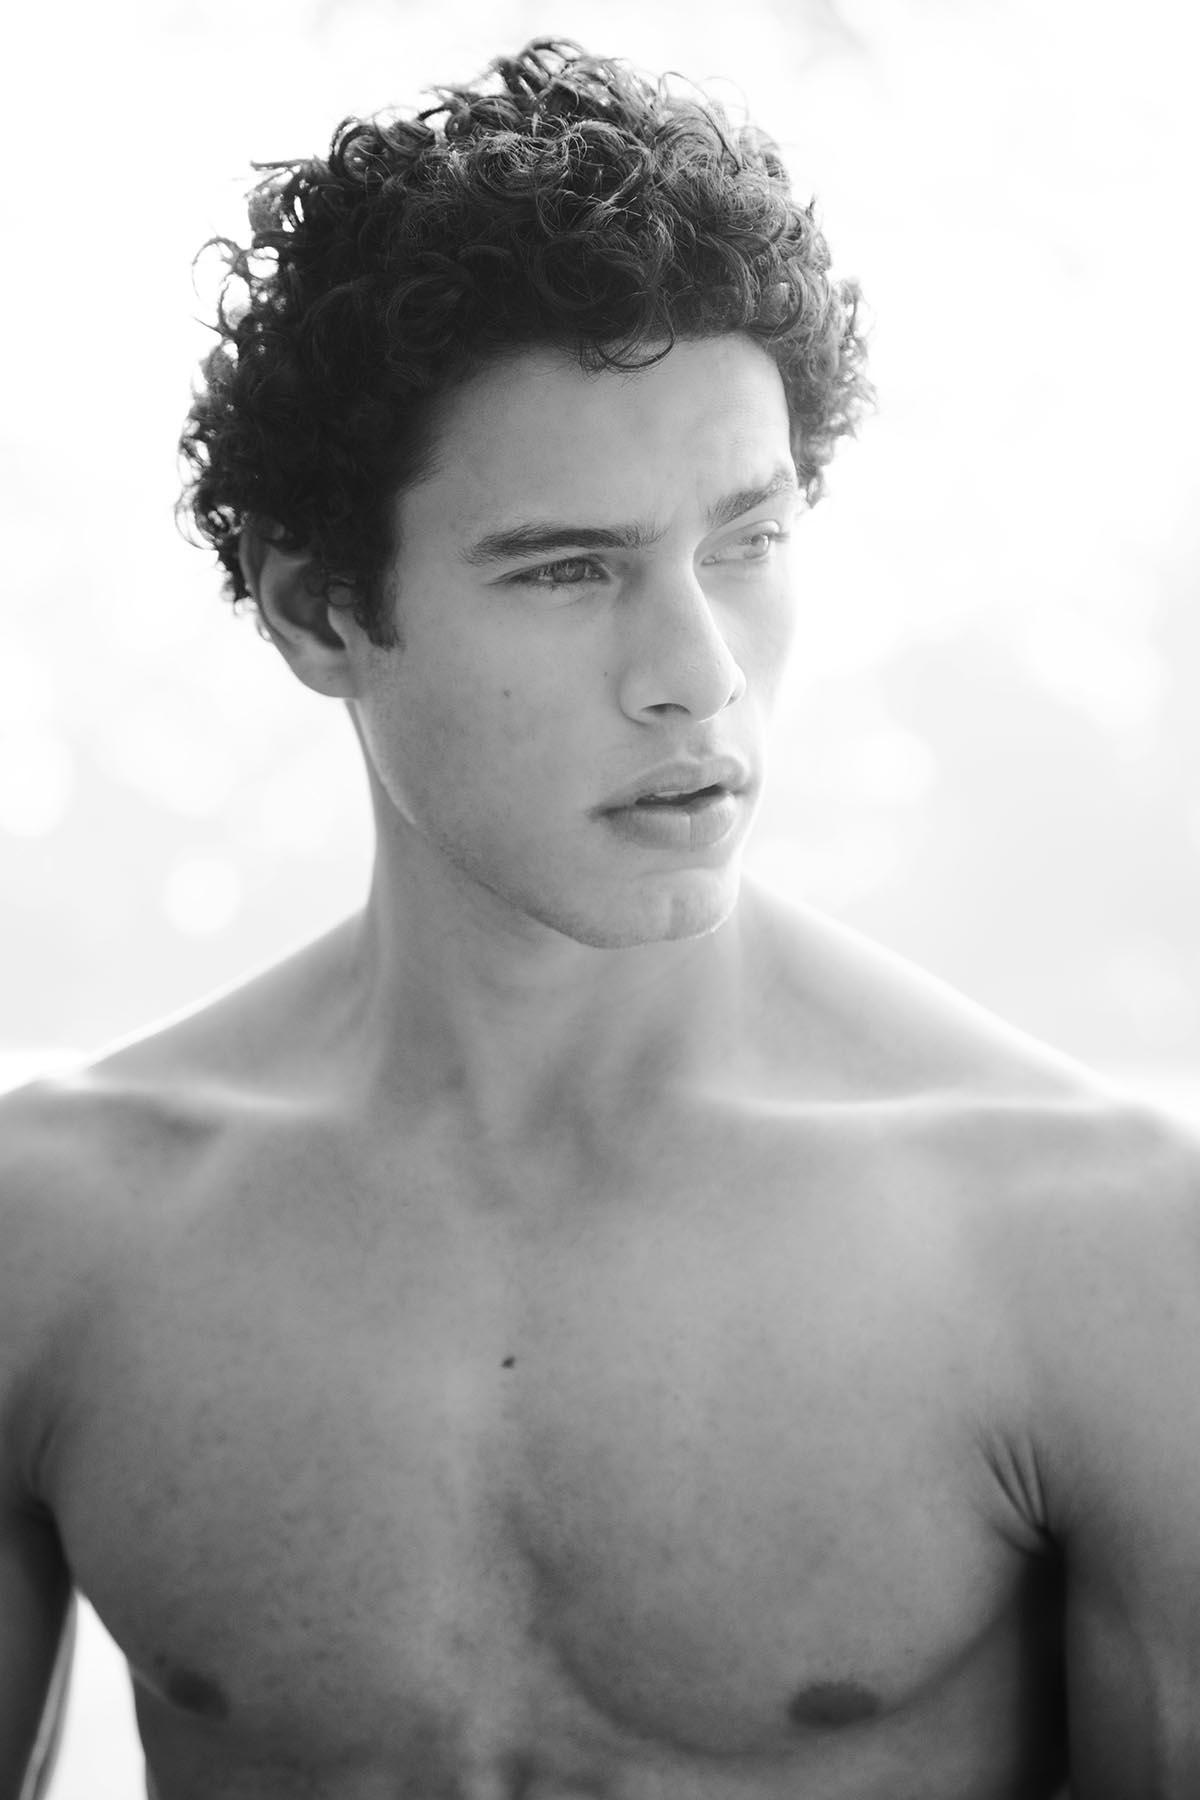 Nathan Corrêa by Moises Almeida for Brazilian Male Model